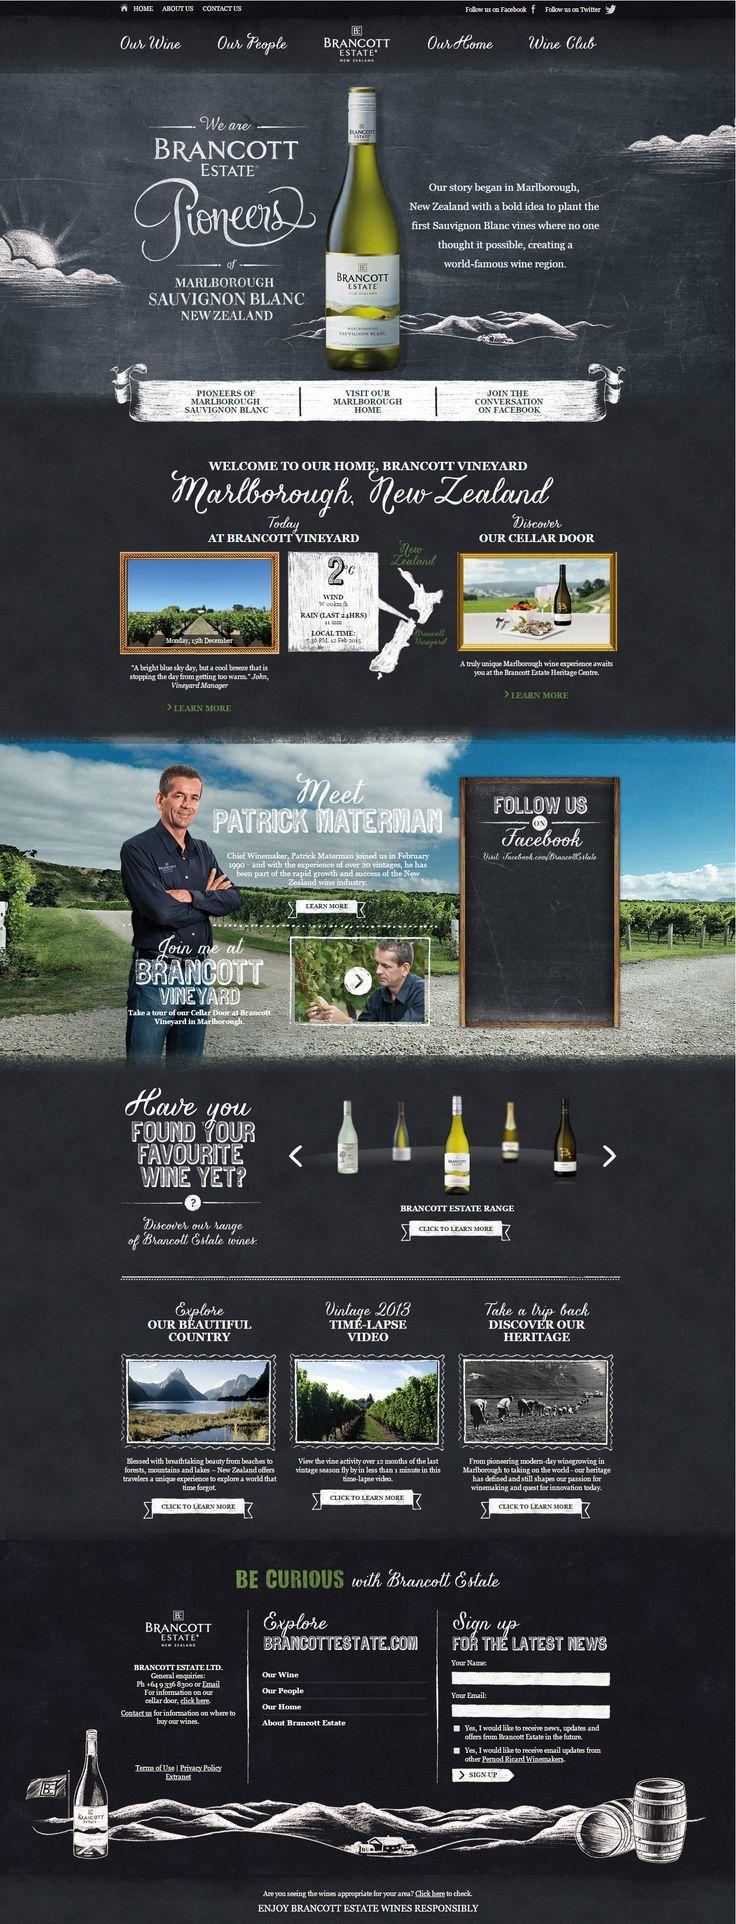 Brancott Estate. The wine pioneers. #webdesign